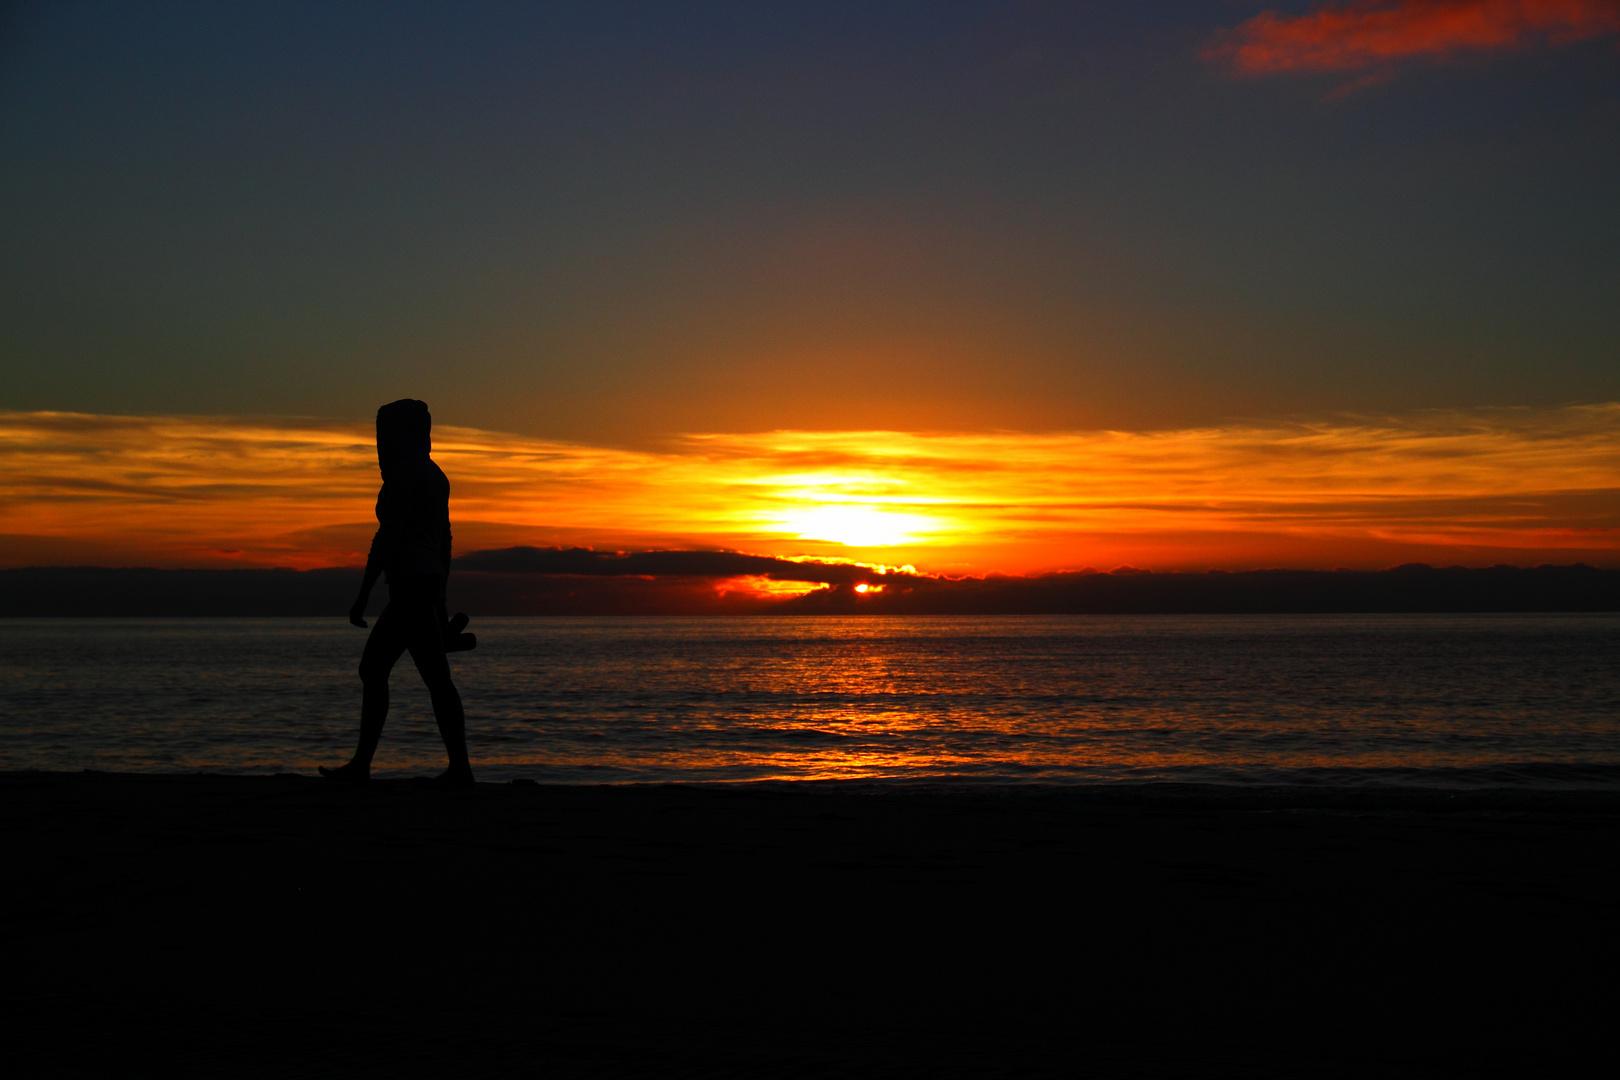 Früh am Morgen am Strand (Sonnenaufgang mit Jogger)